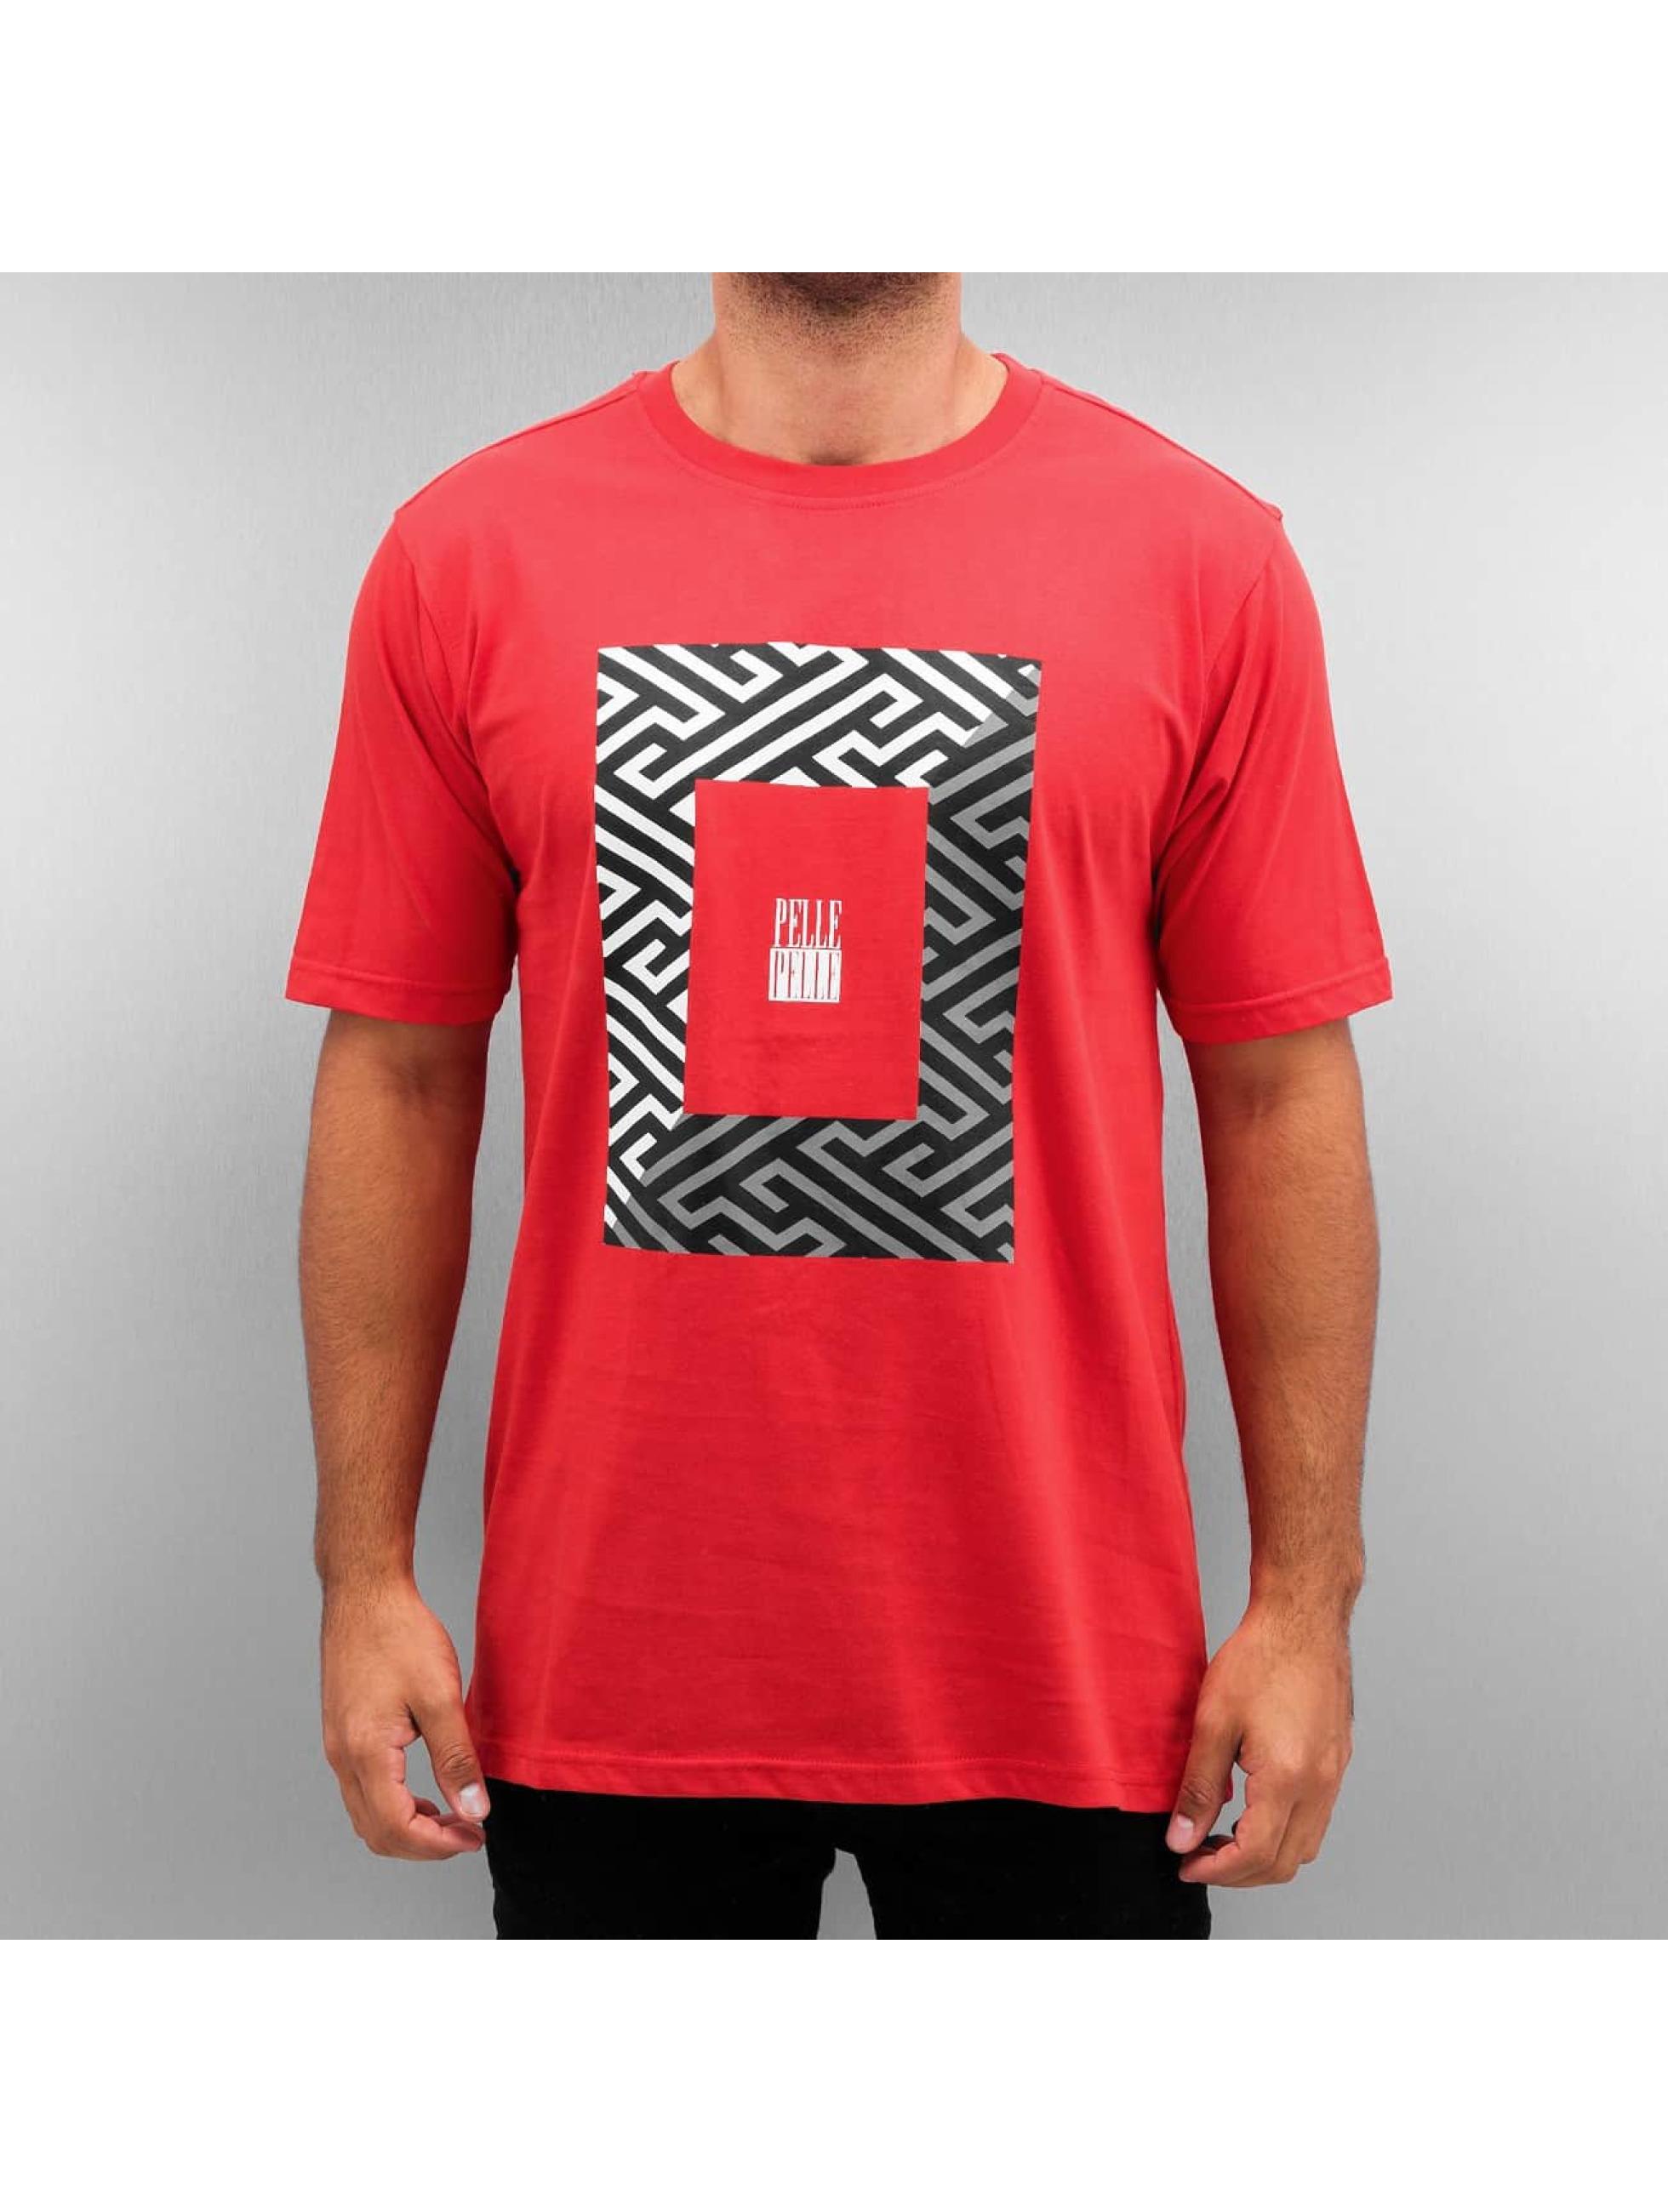 Pelle Pelle T-shirts 50/50 Dark Maze rød